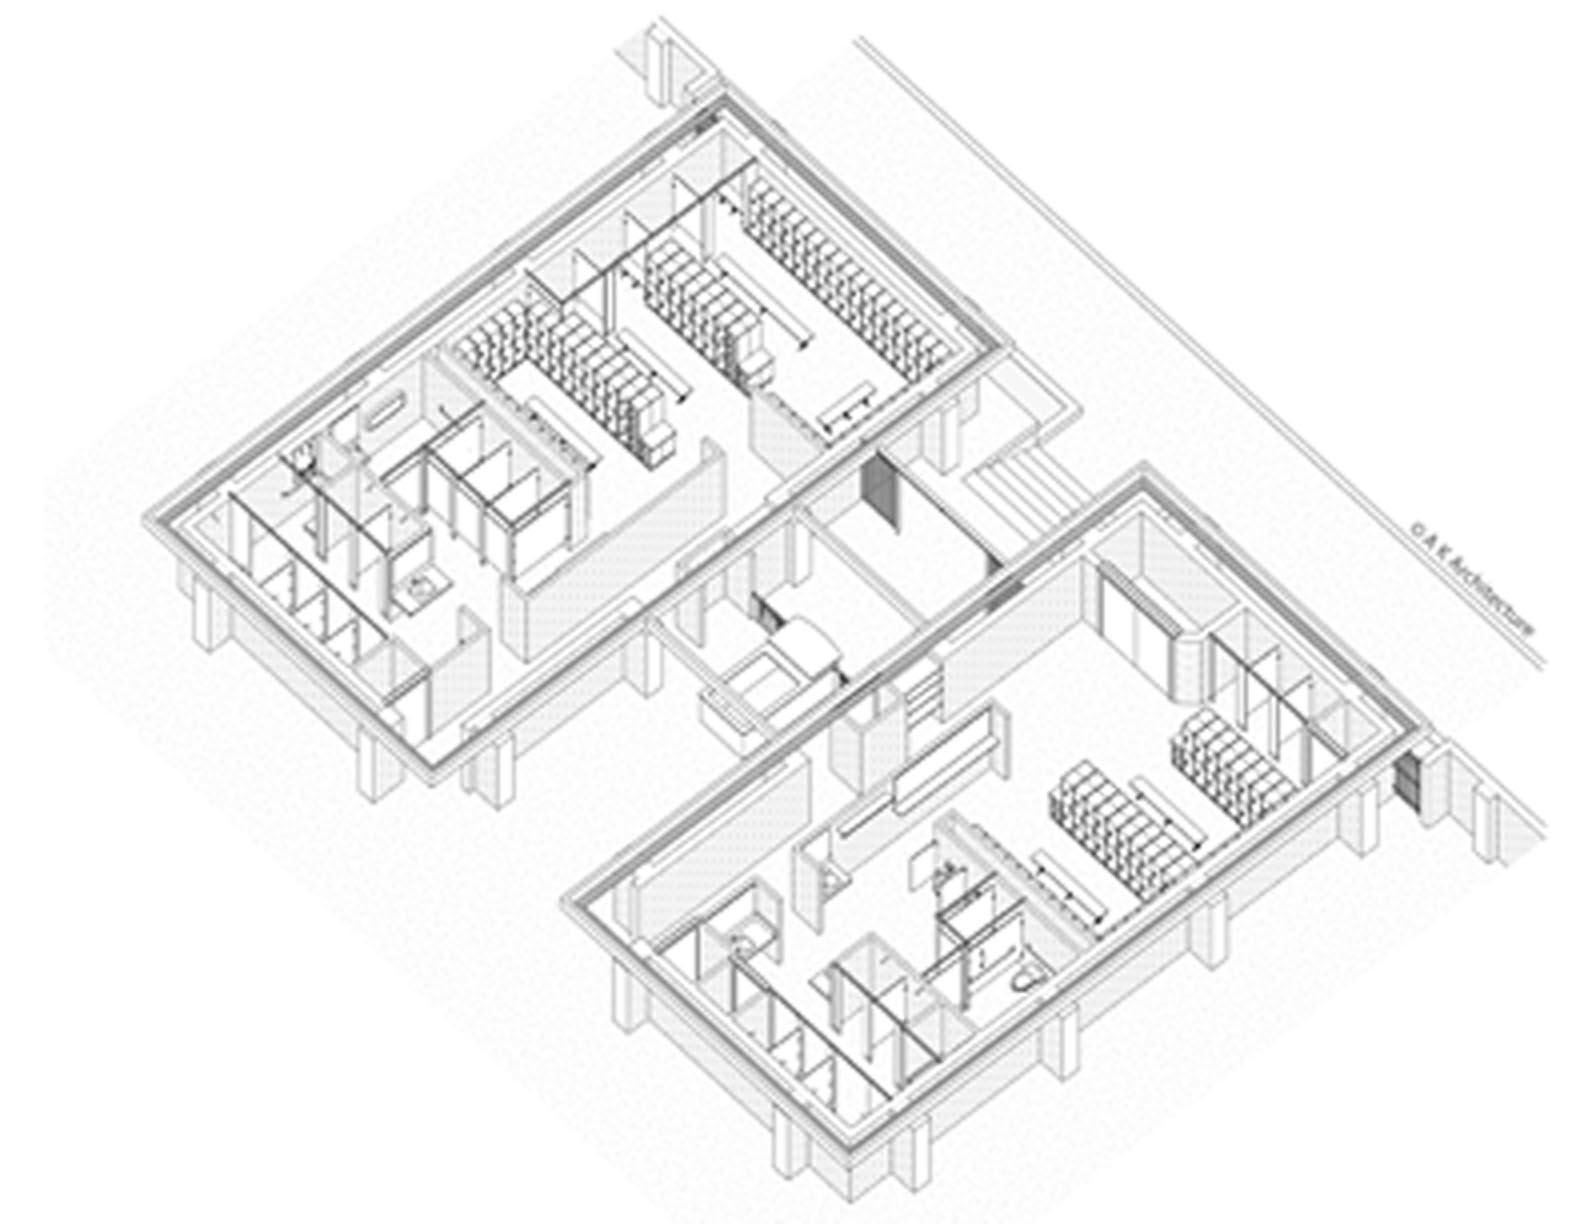 1584x1224 Plans For Locker Room Renovation